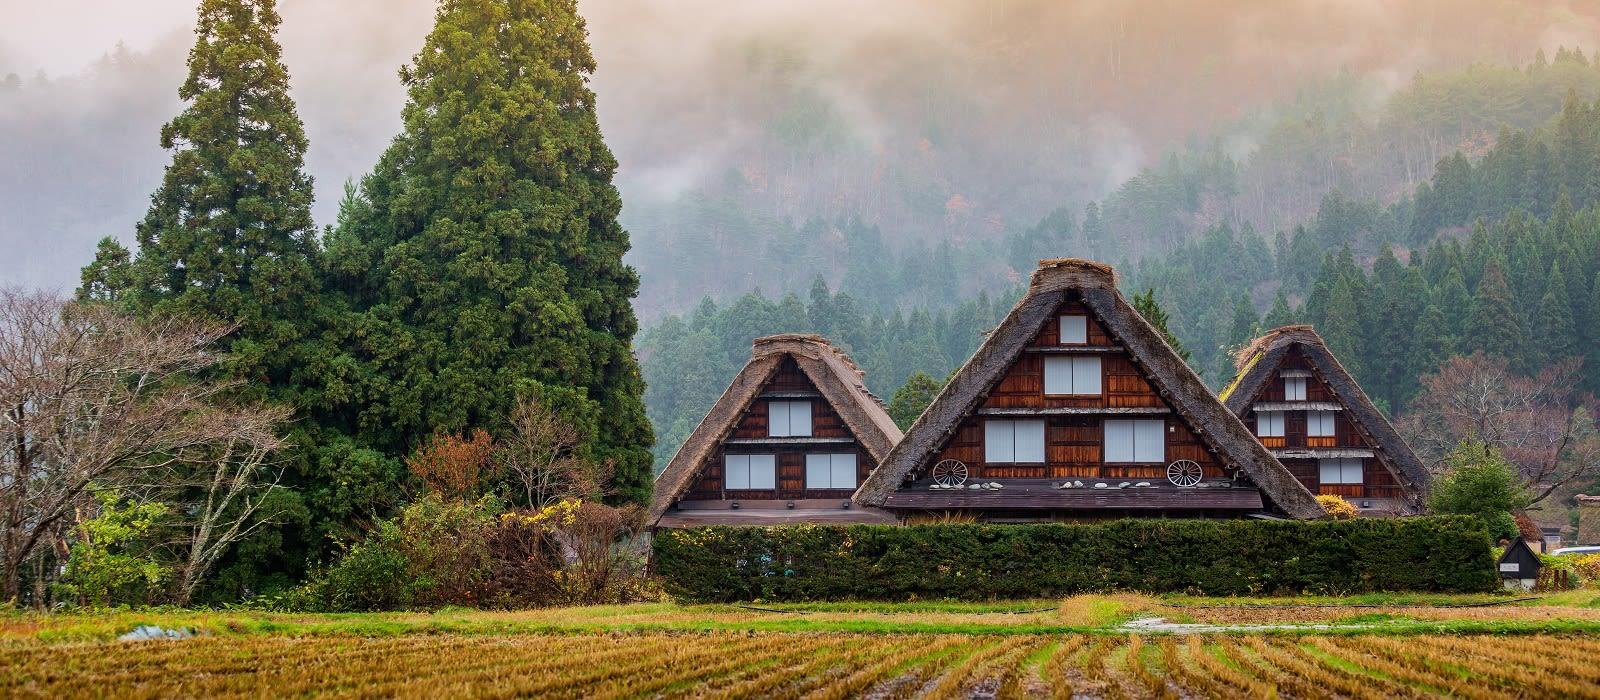 Japan's Hidden Treasures Tour Trip 3